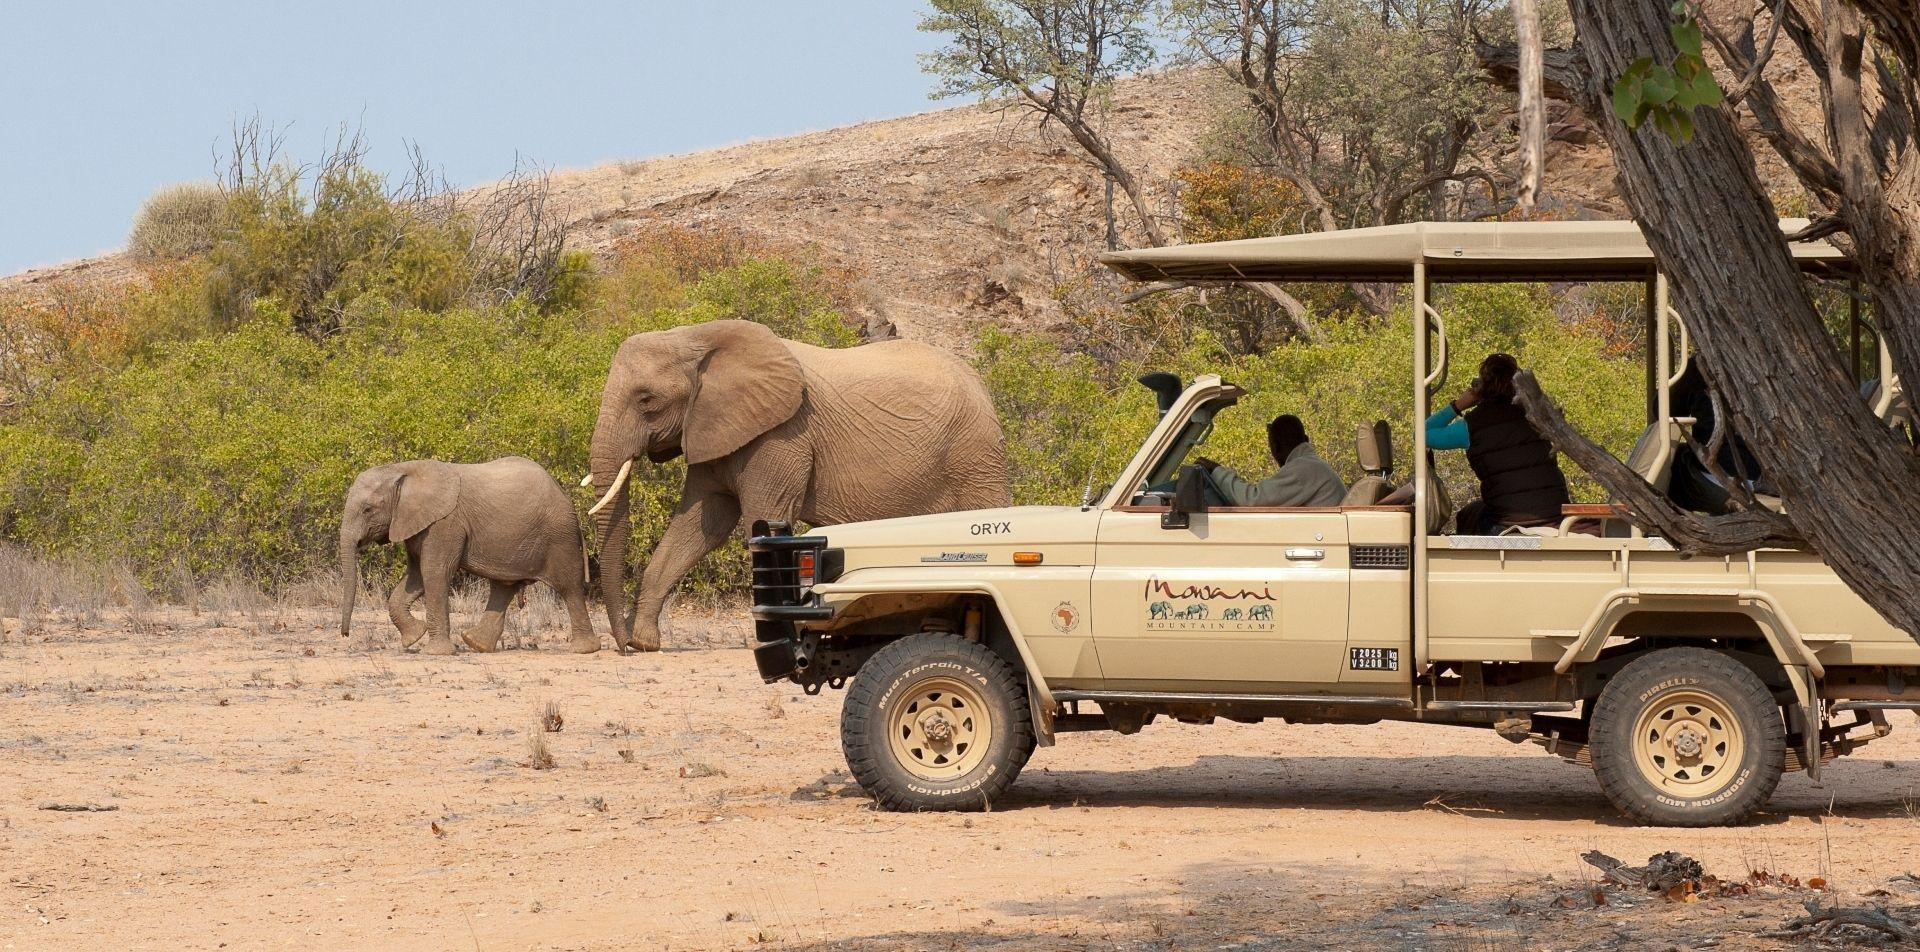 Join a Mowani safari in search of the elusive desert elephant